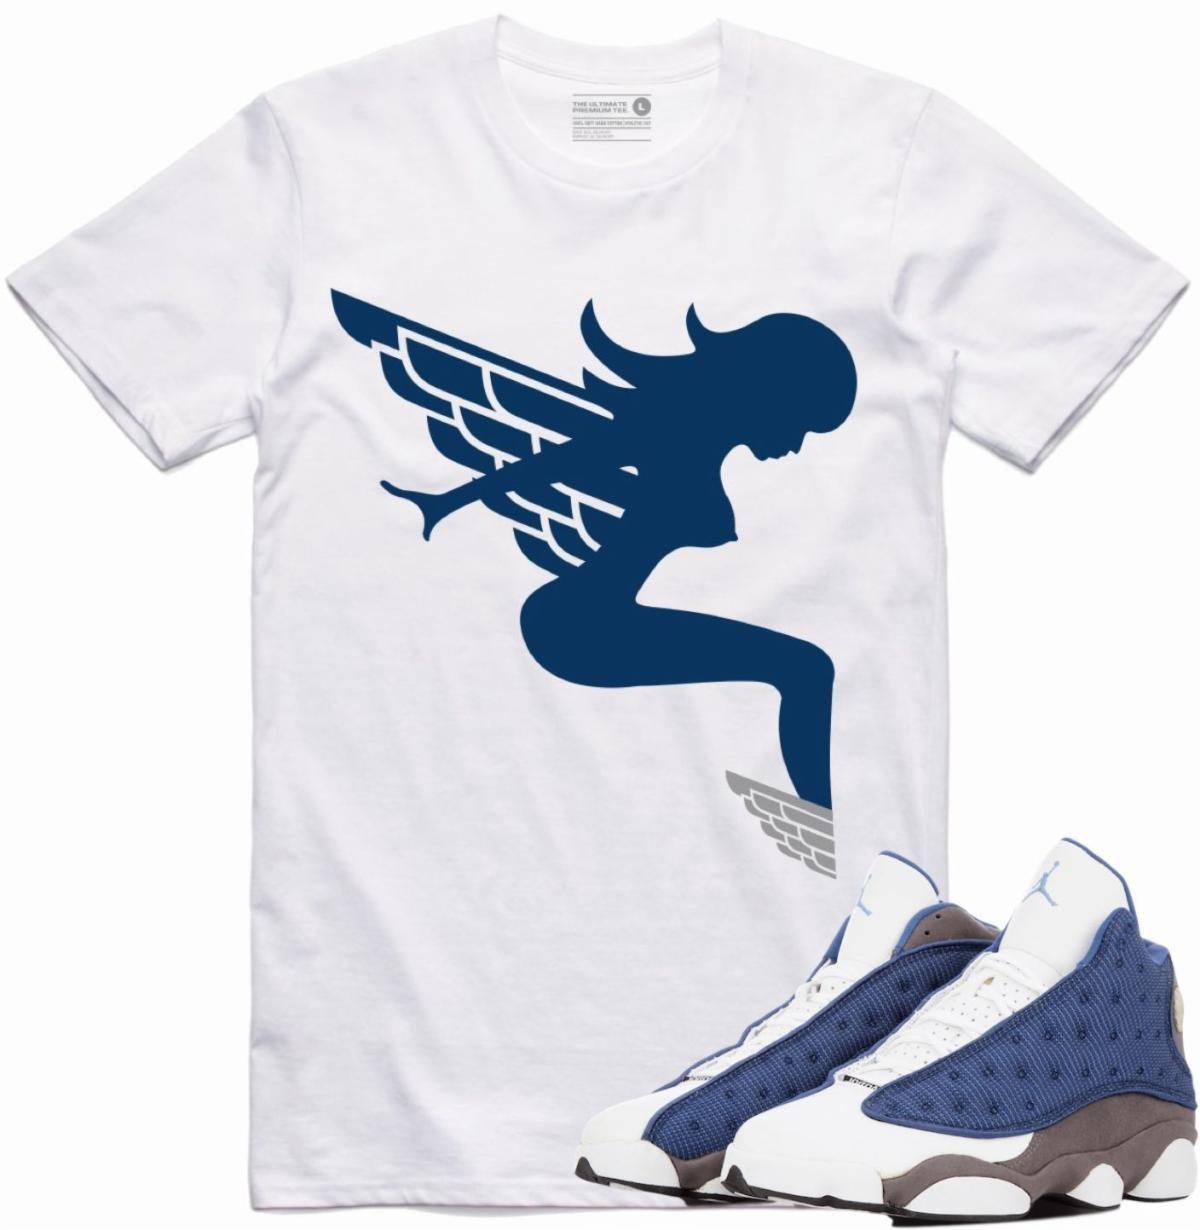 Xgear101 Com Jordan Flint 13s Sneaker Tees Milled